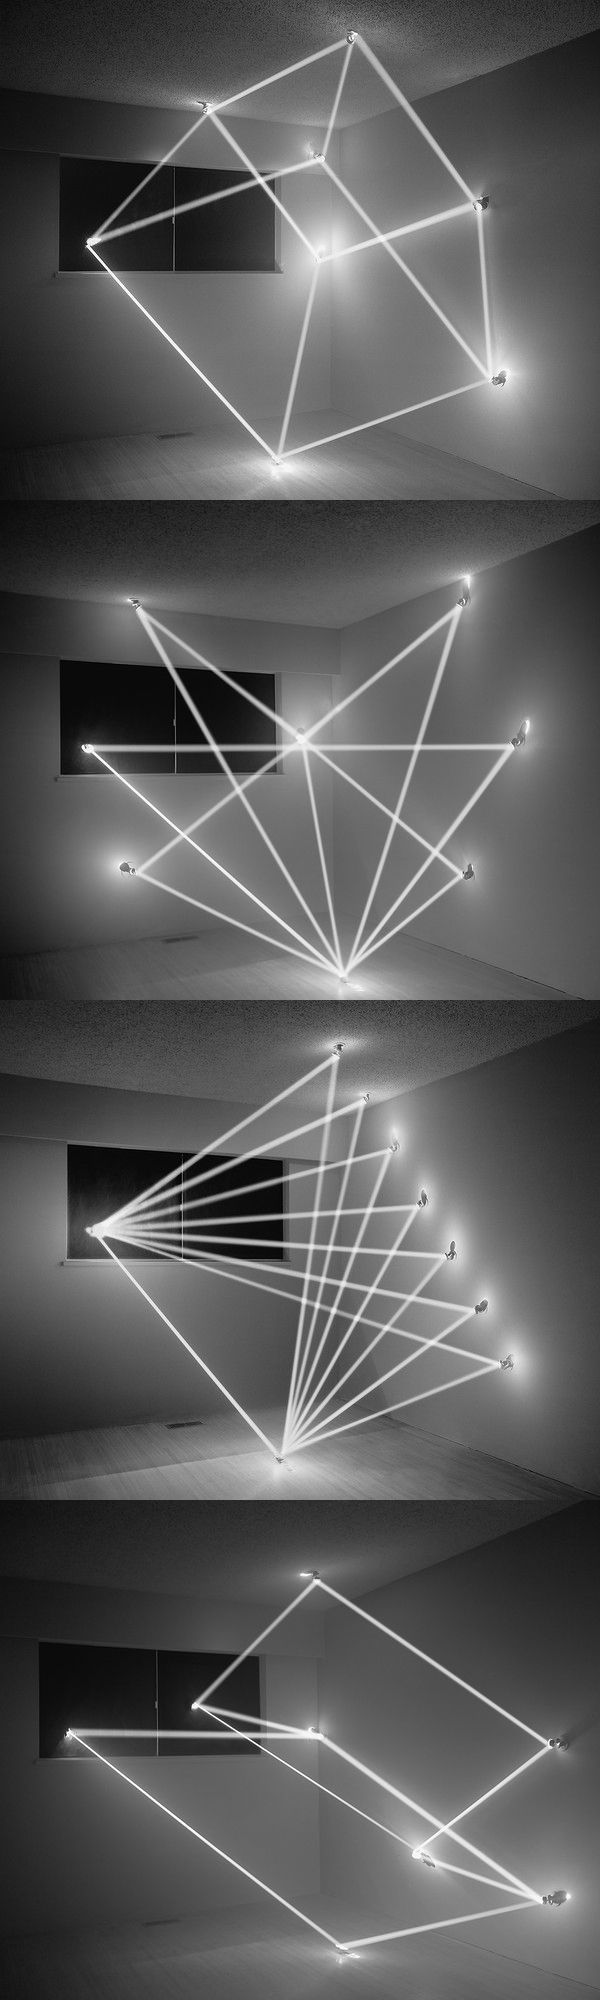 Geometric Abstraction using Light Beams :: James Nizam